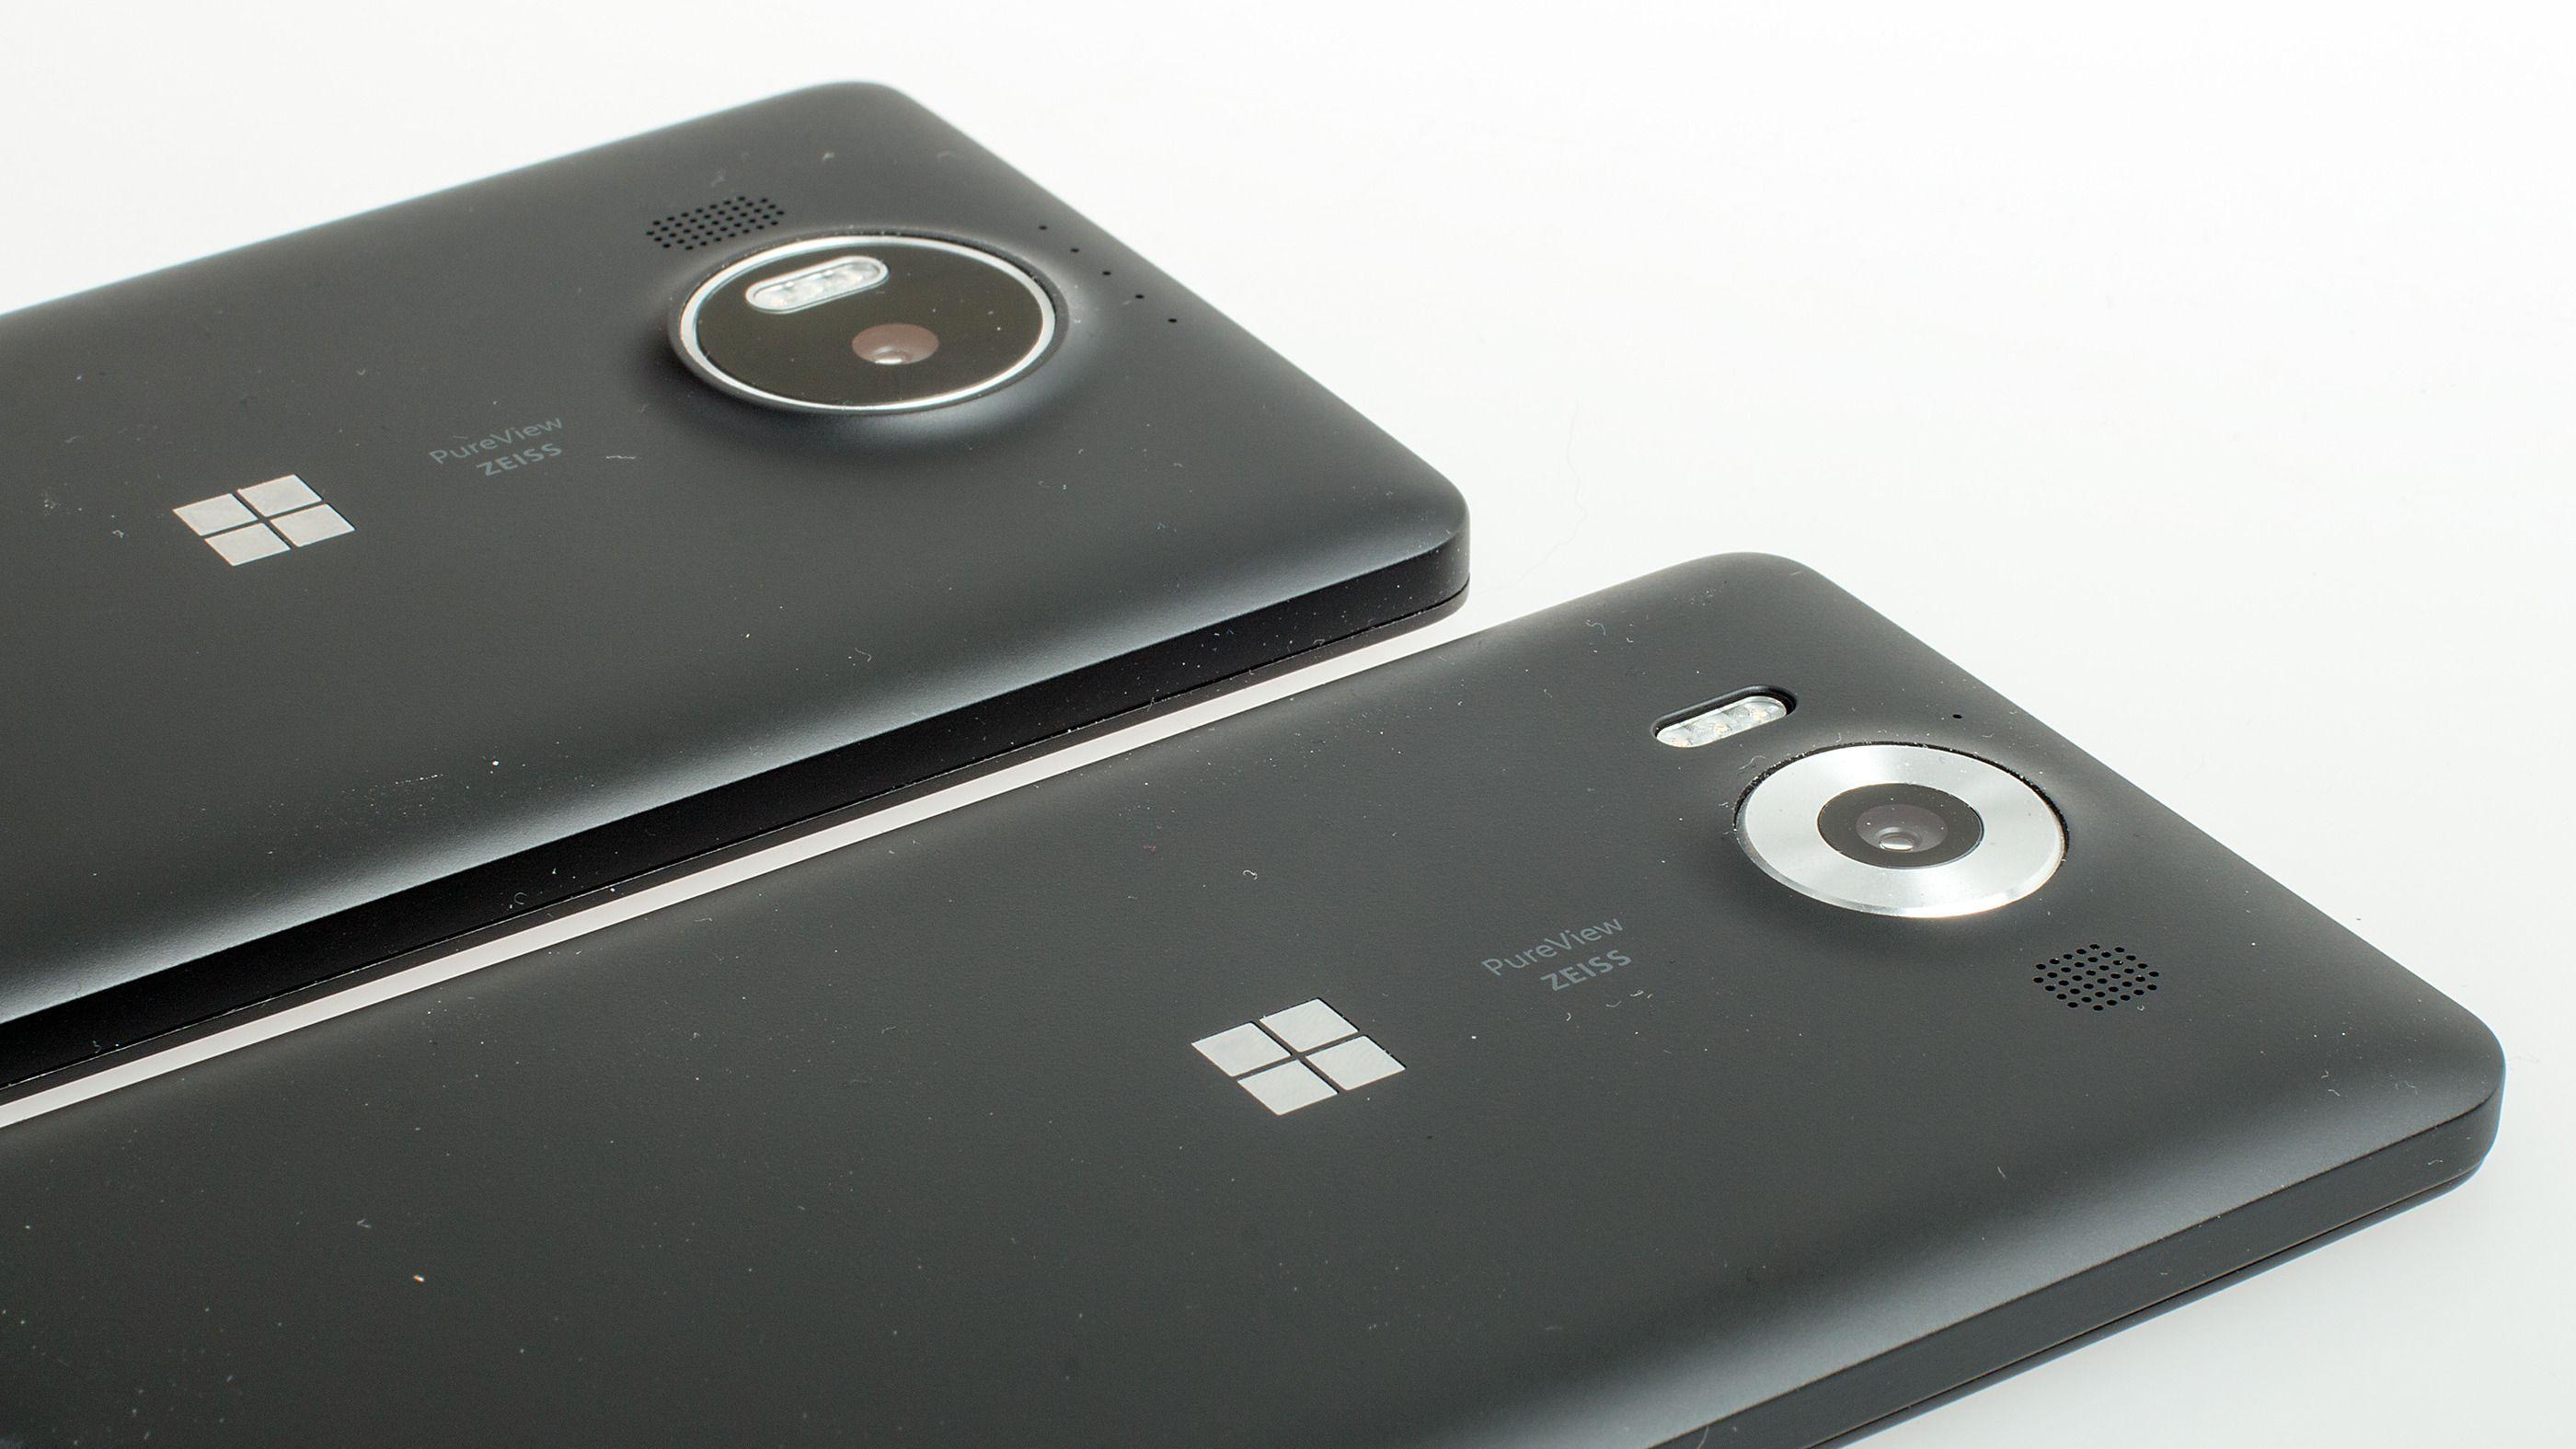 Lumia 950 XL (øverst) og Lumia 950 kan bli de siste toppmodellene i Lumia-serien.